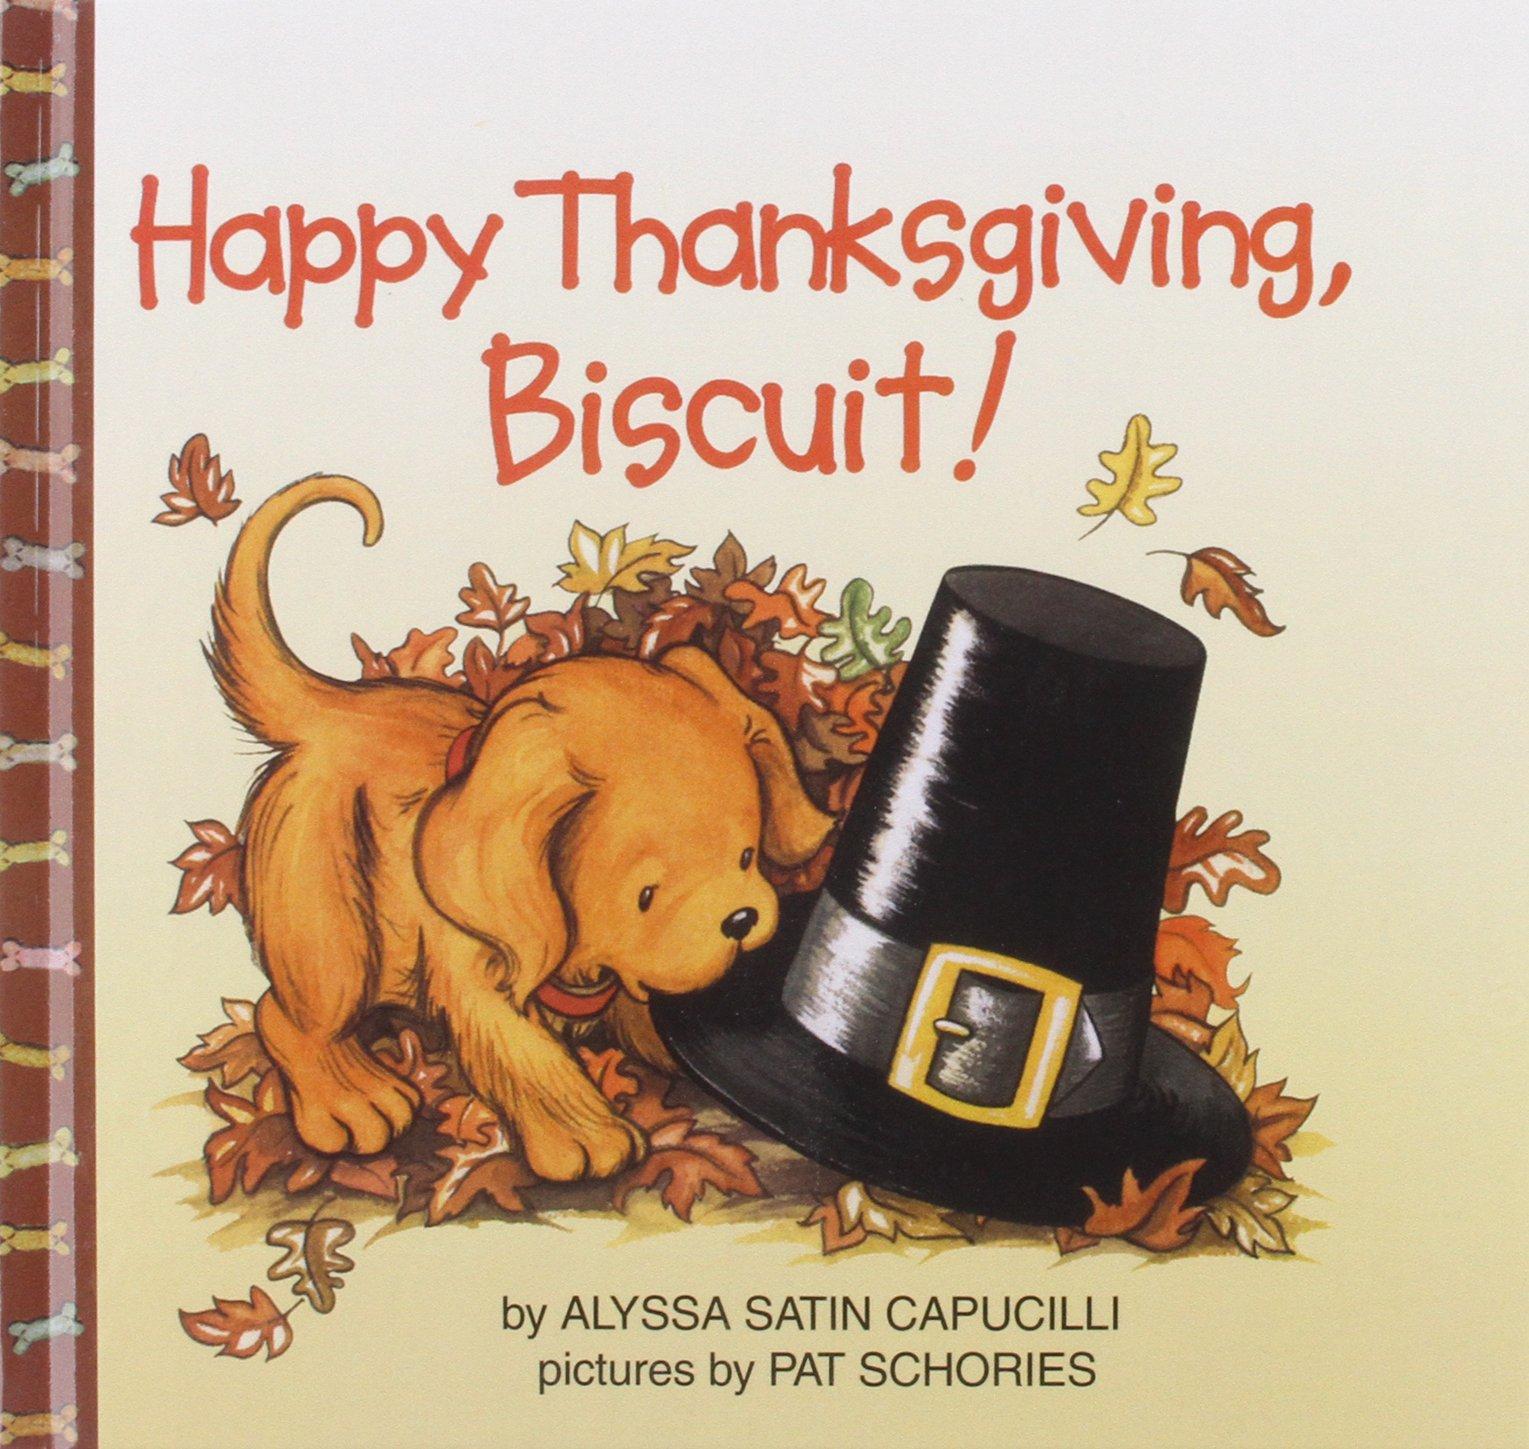 Happy Thanksgiving, Biscuit